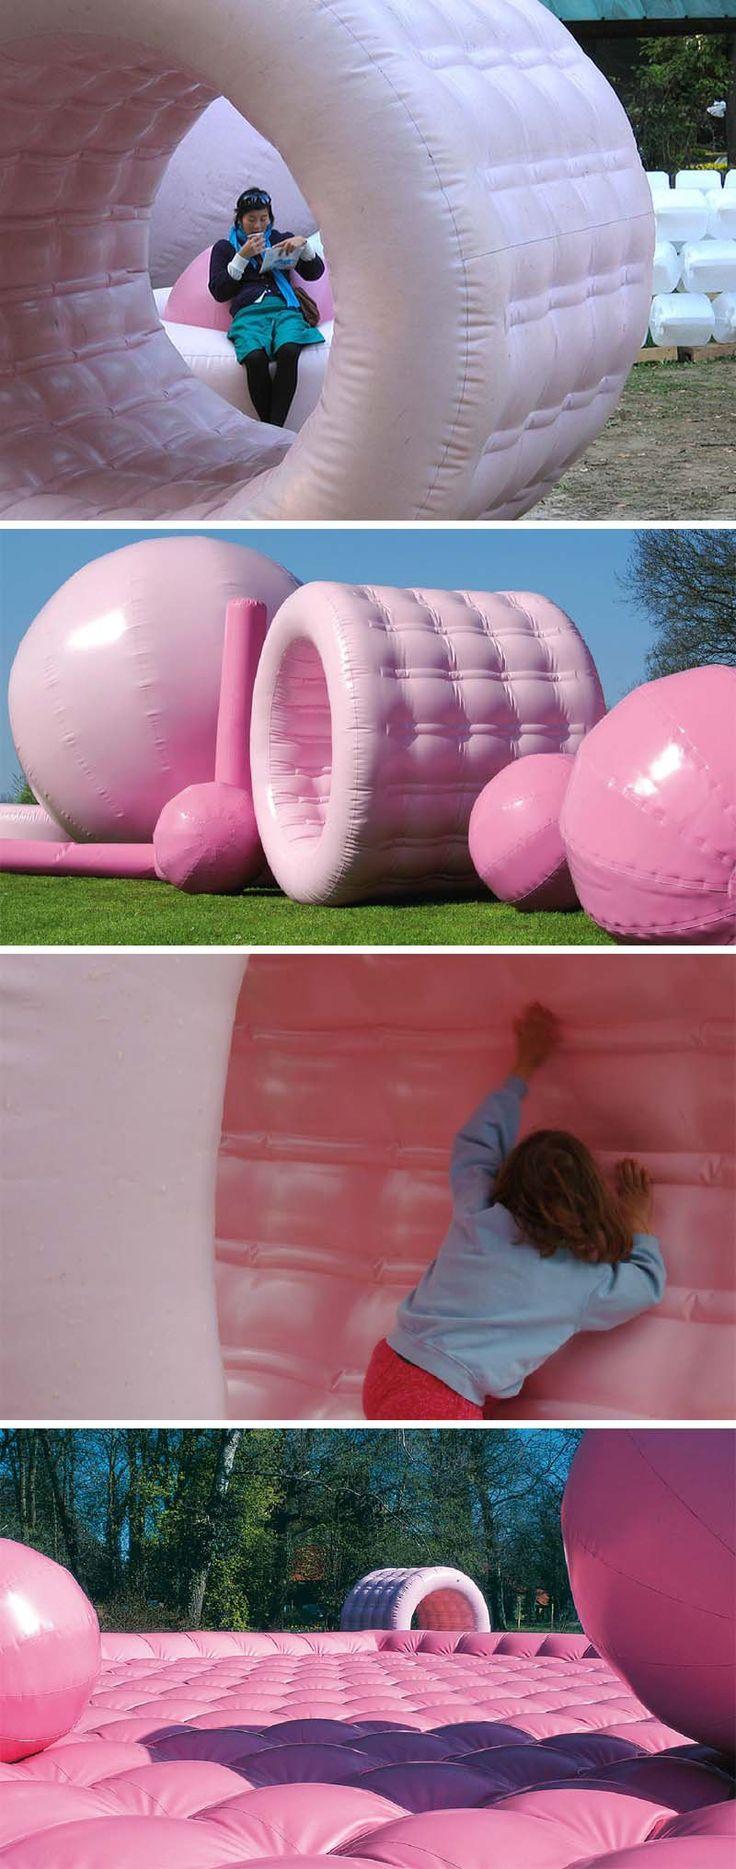 Topotek 1, Cool, inflatable, temporary playground, installation, interactive, landscape architecture, State Garden Show Wolfsburg